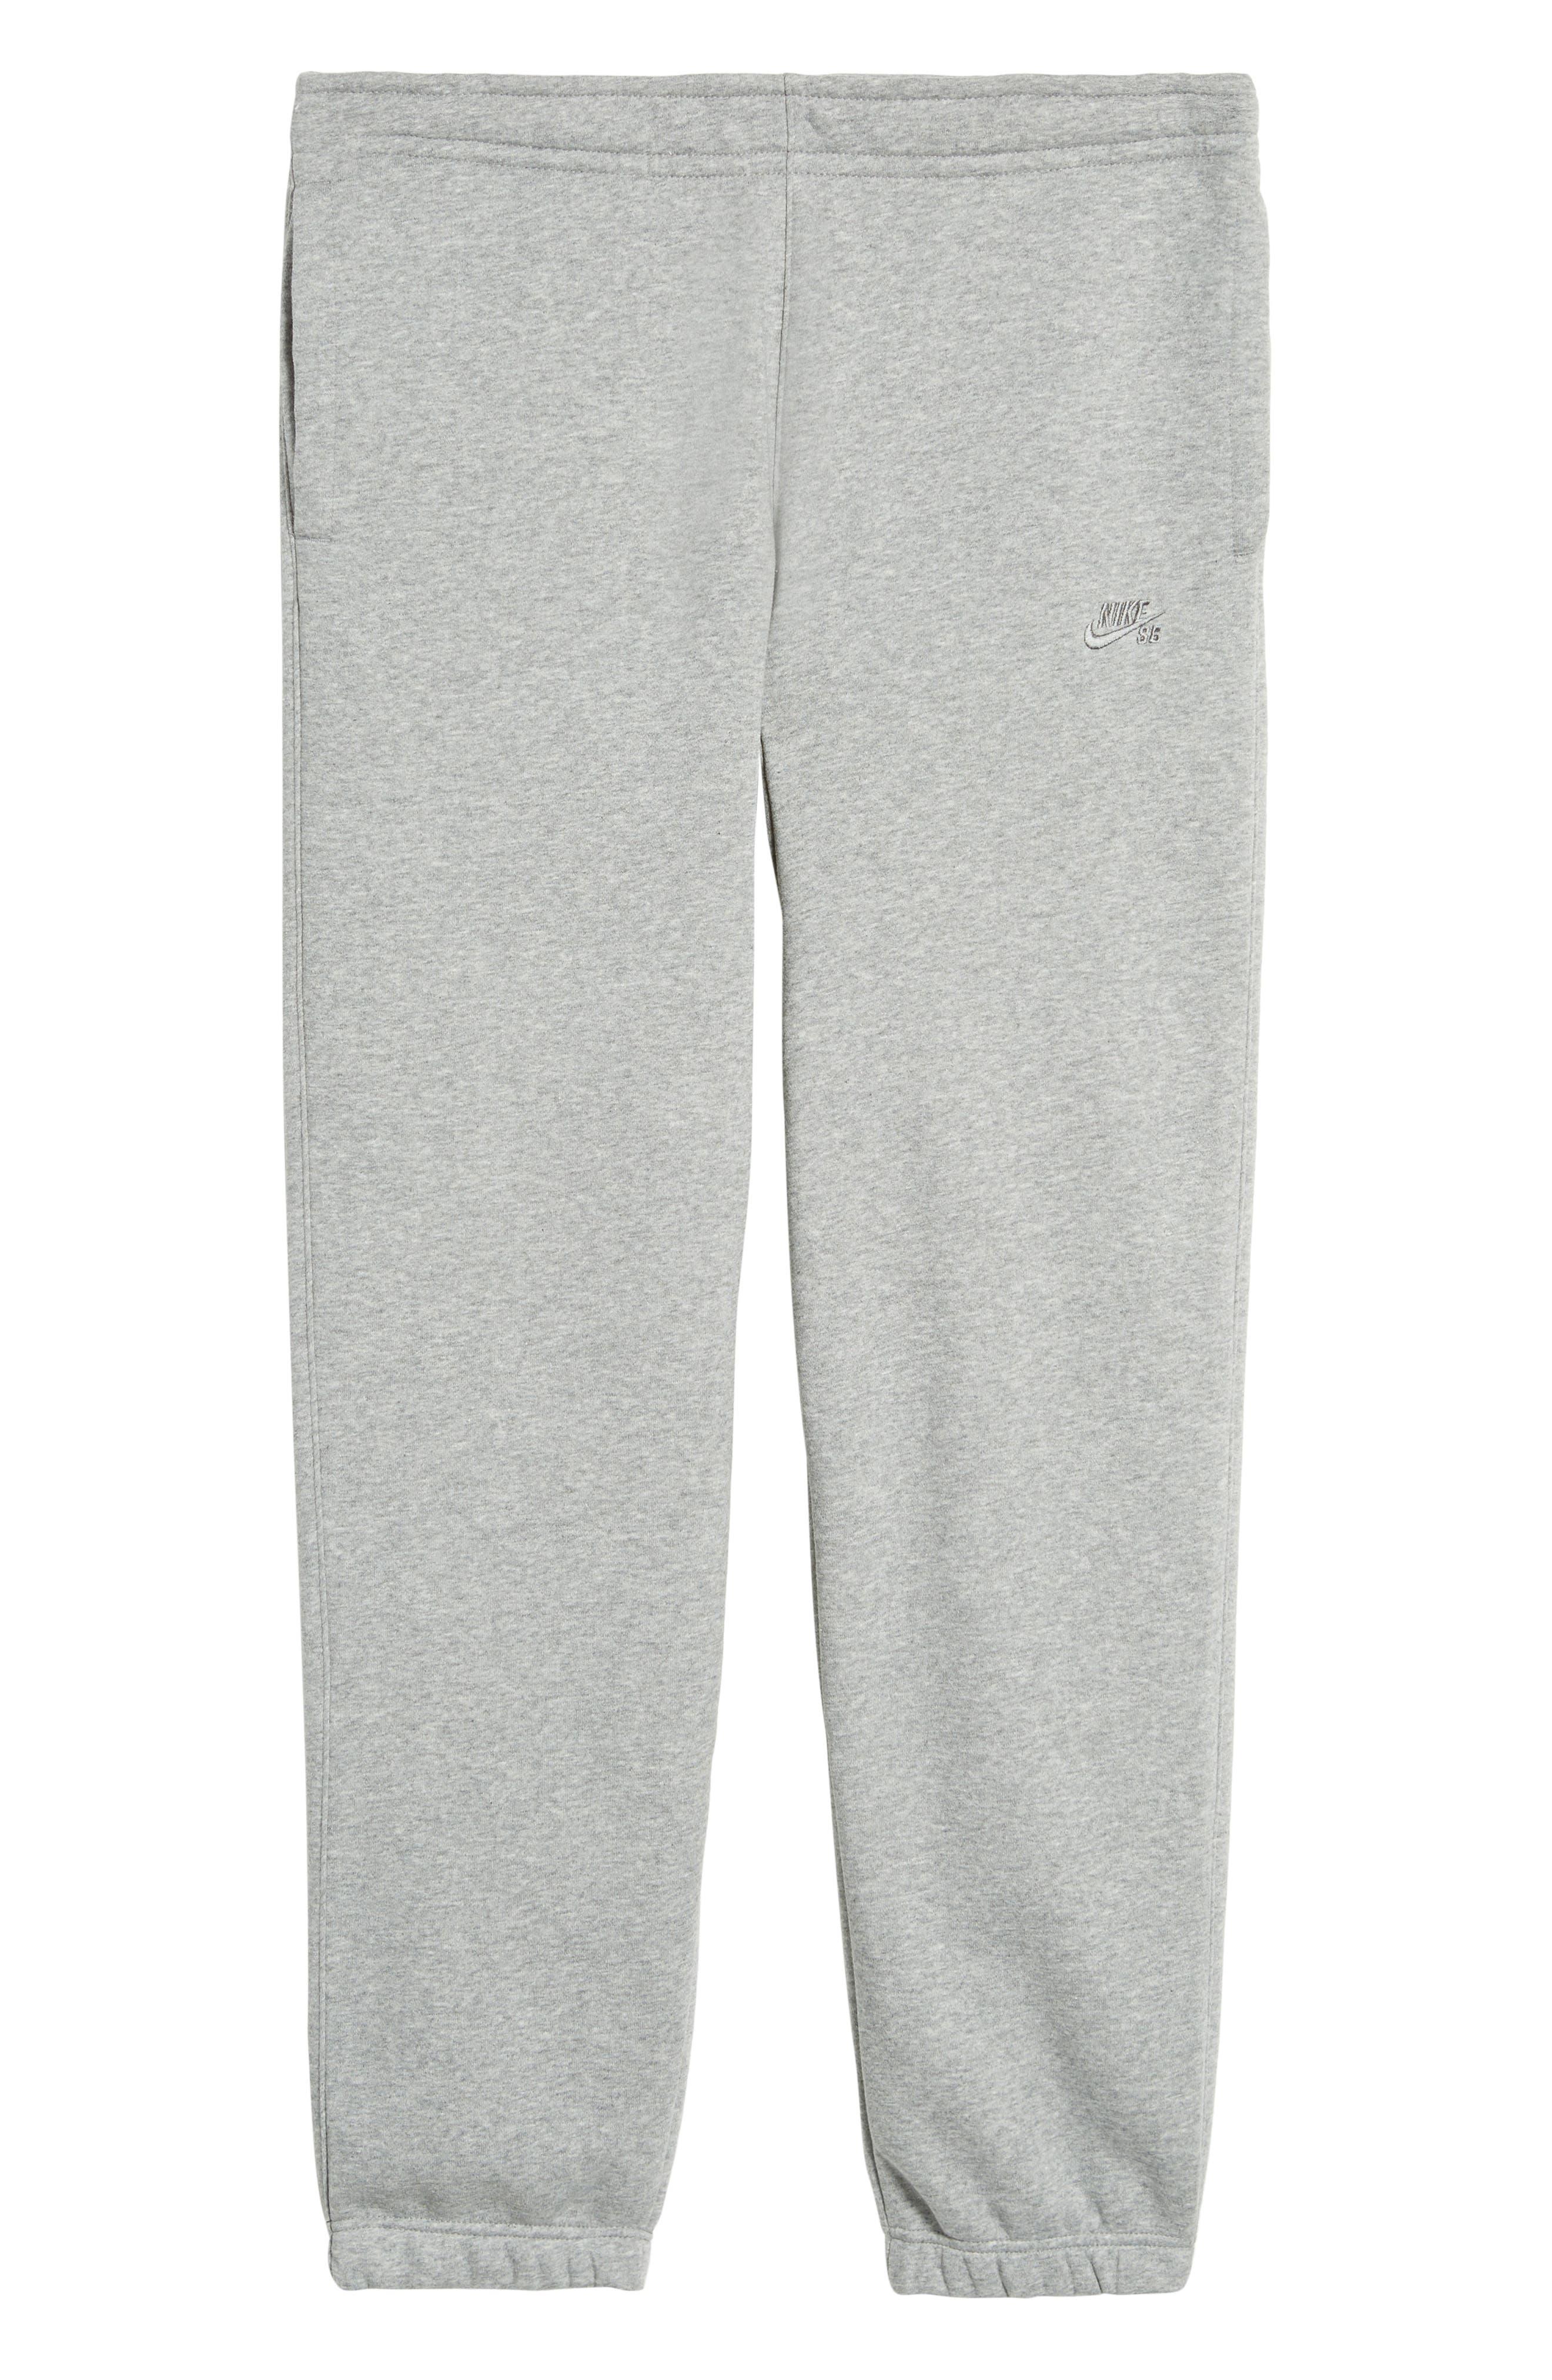 Icon Fleece Pants,                             Alternate thumbnail 6, color,                             Dark Steel Grey